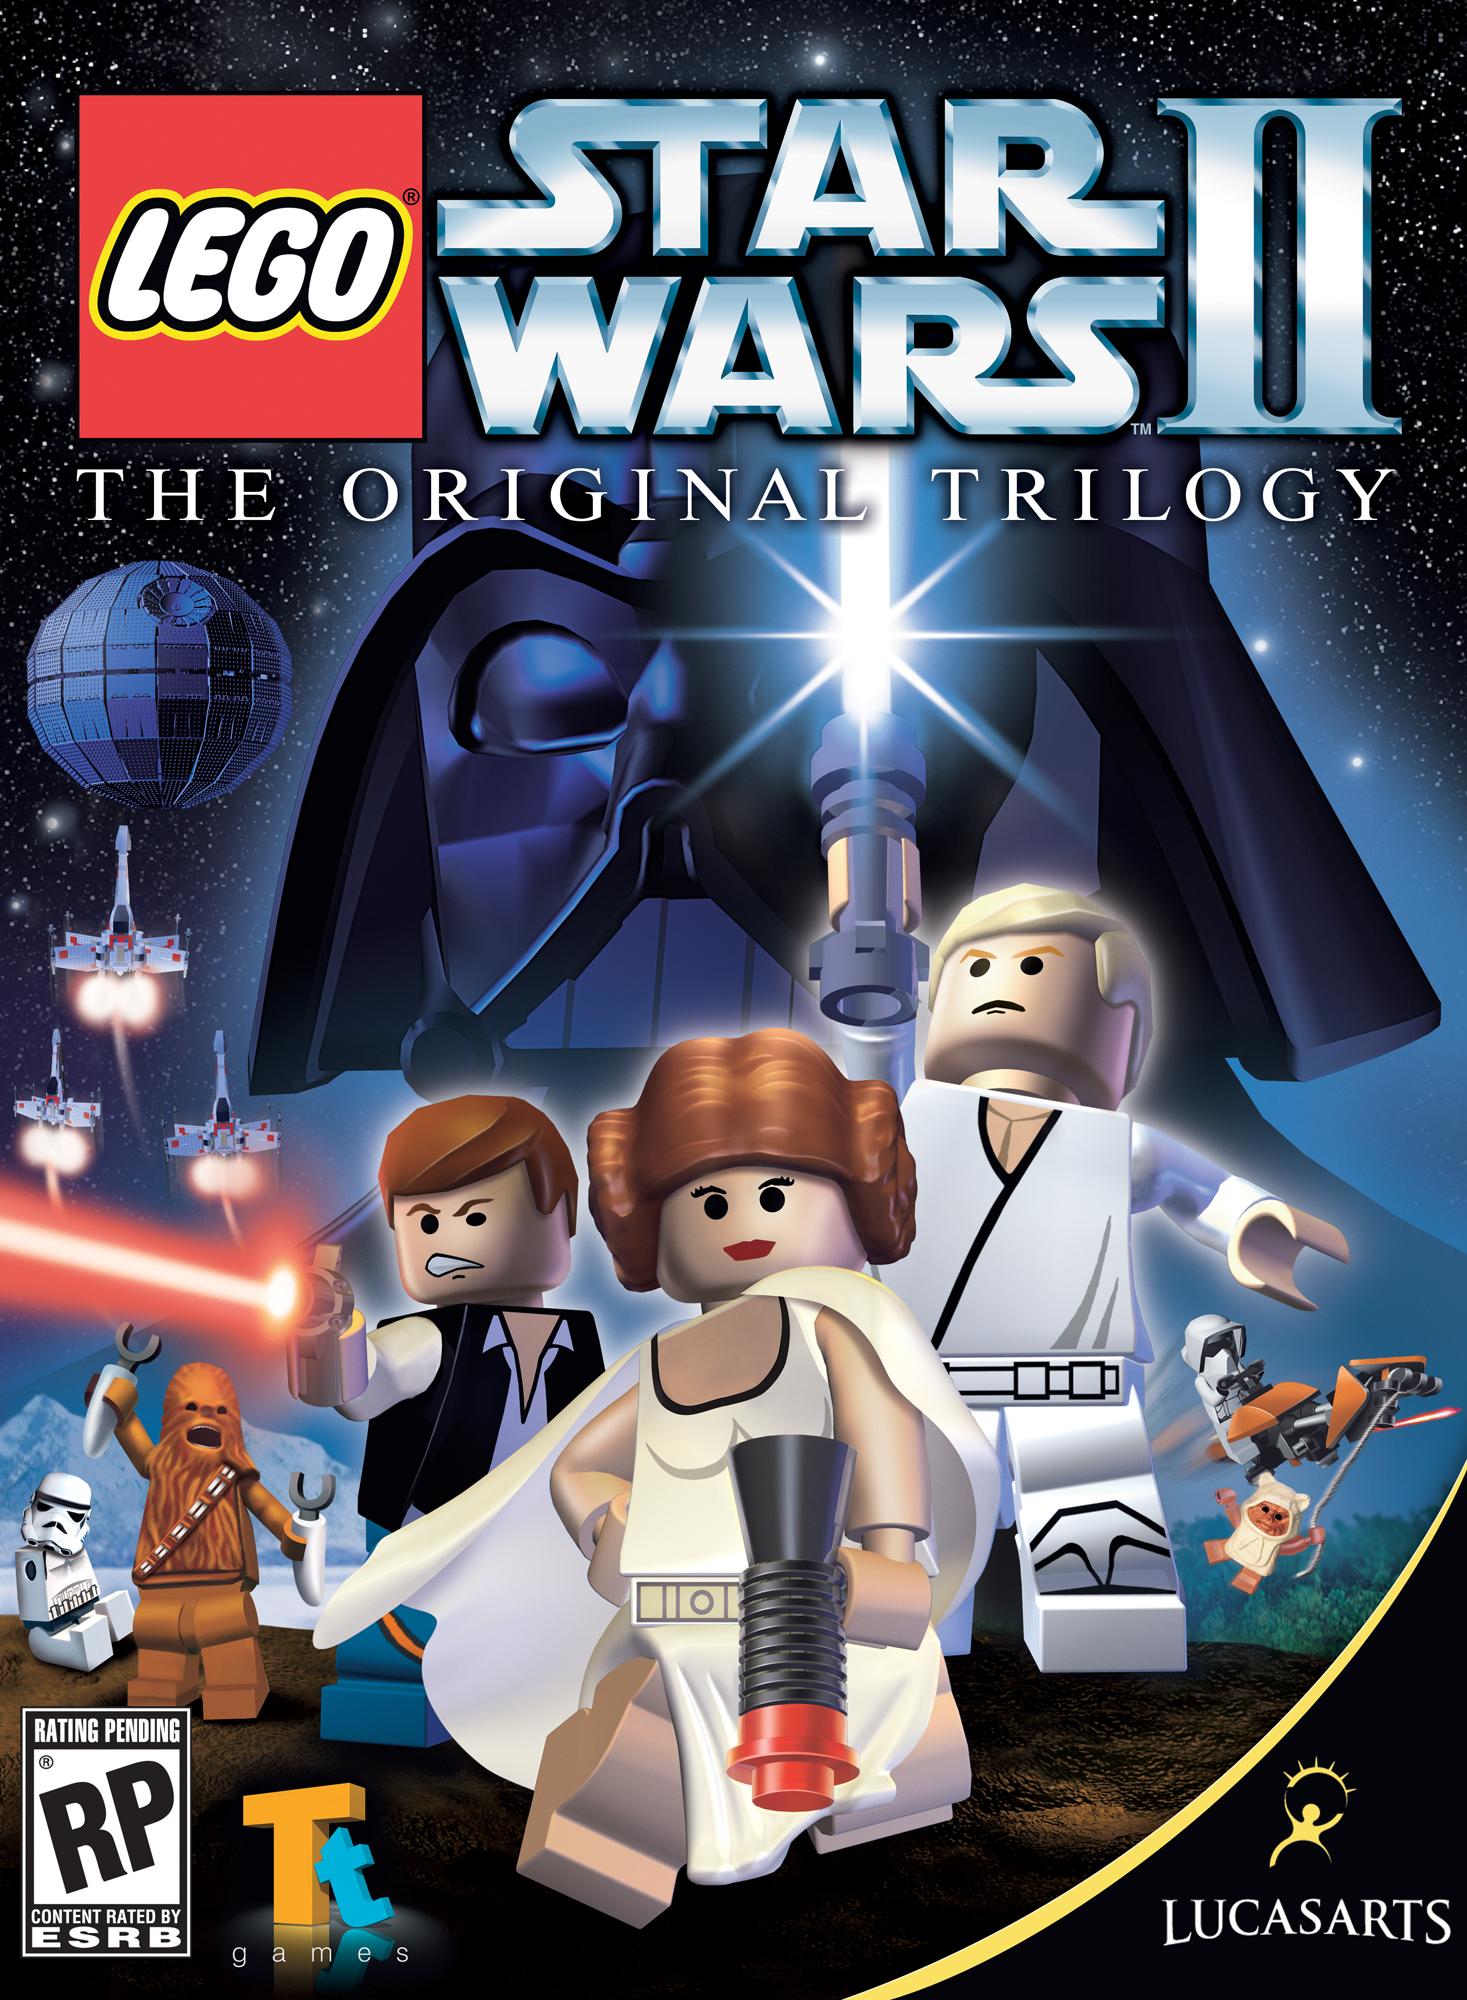 lego star wars ii the original trilogy  wookieepedia  wikia